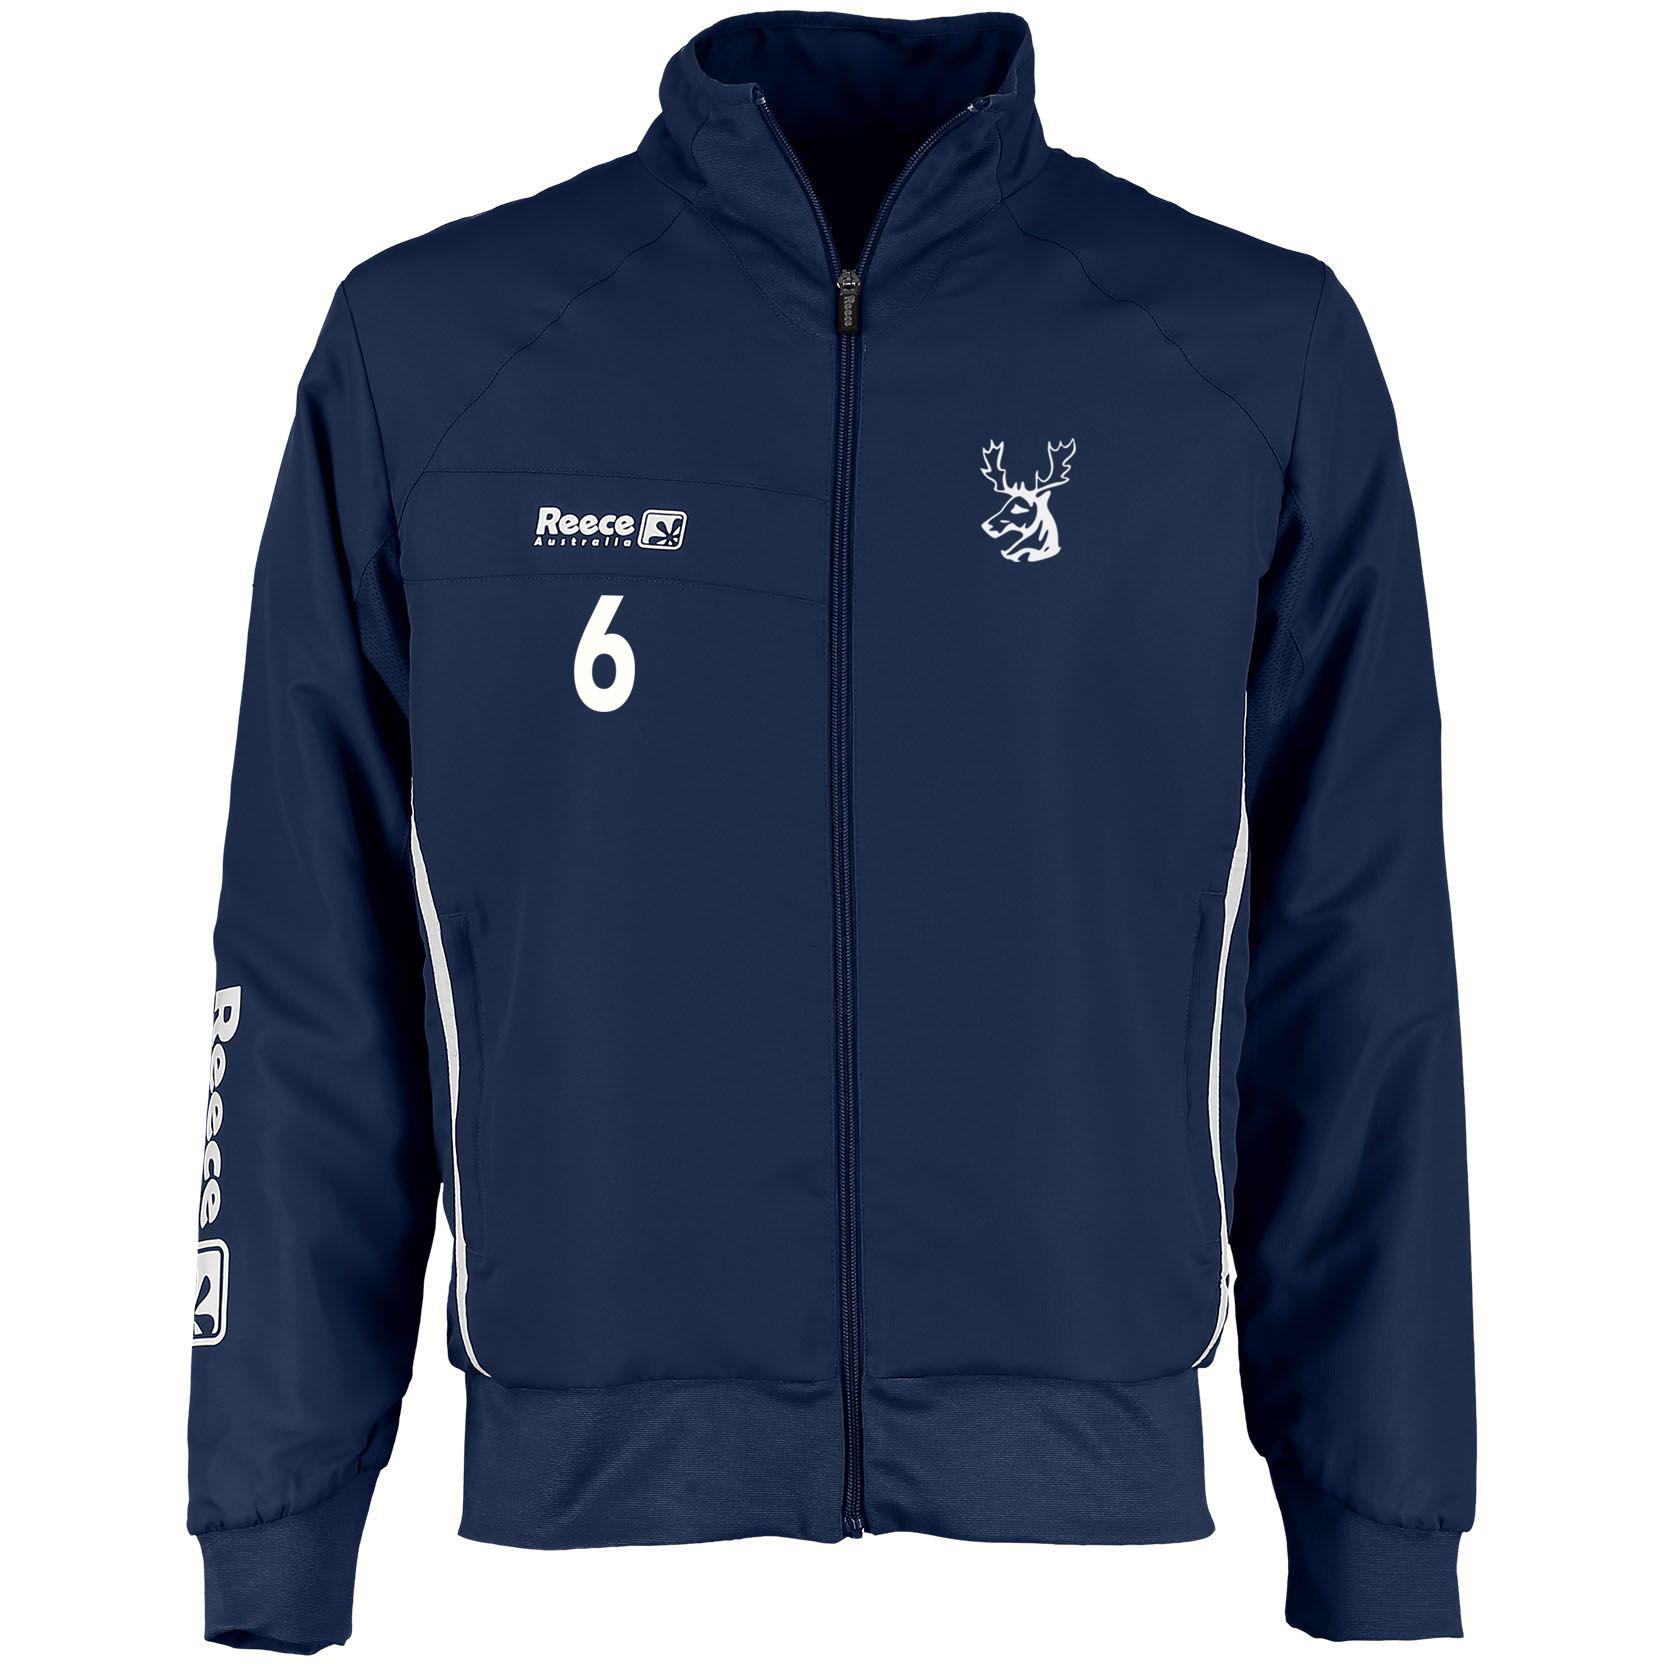 jacket-navy-number